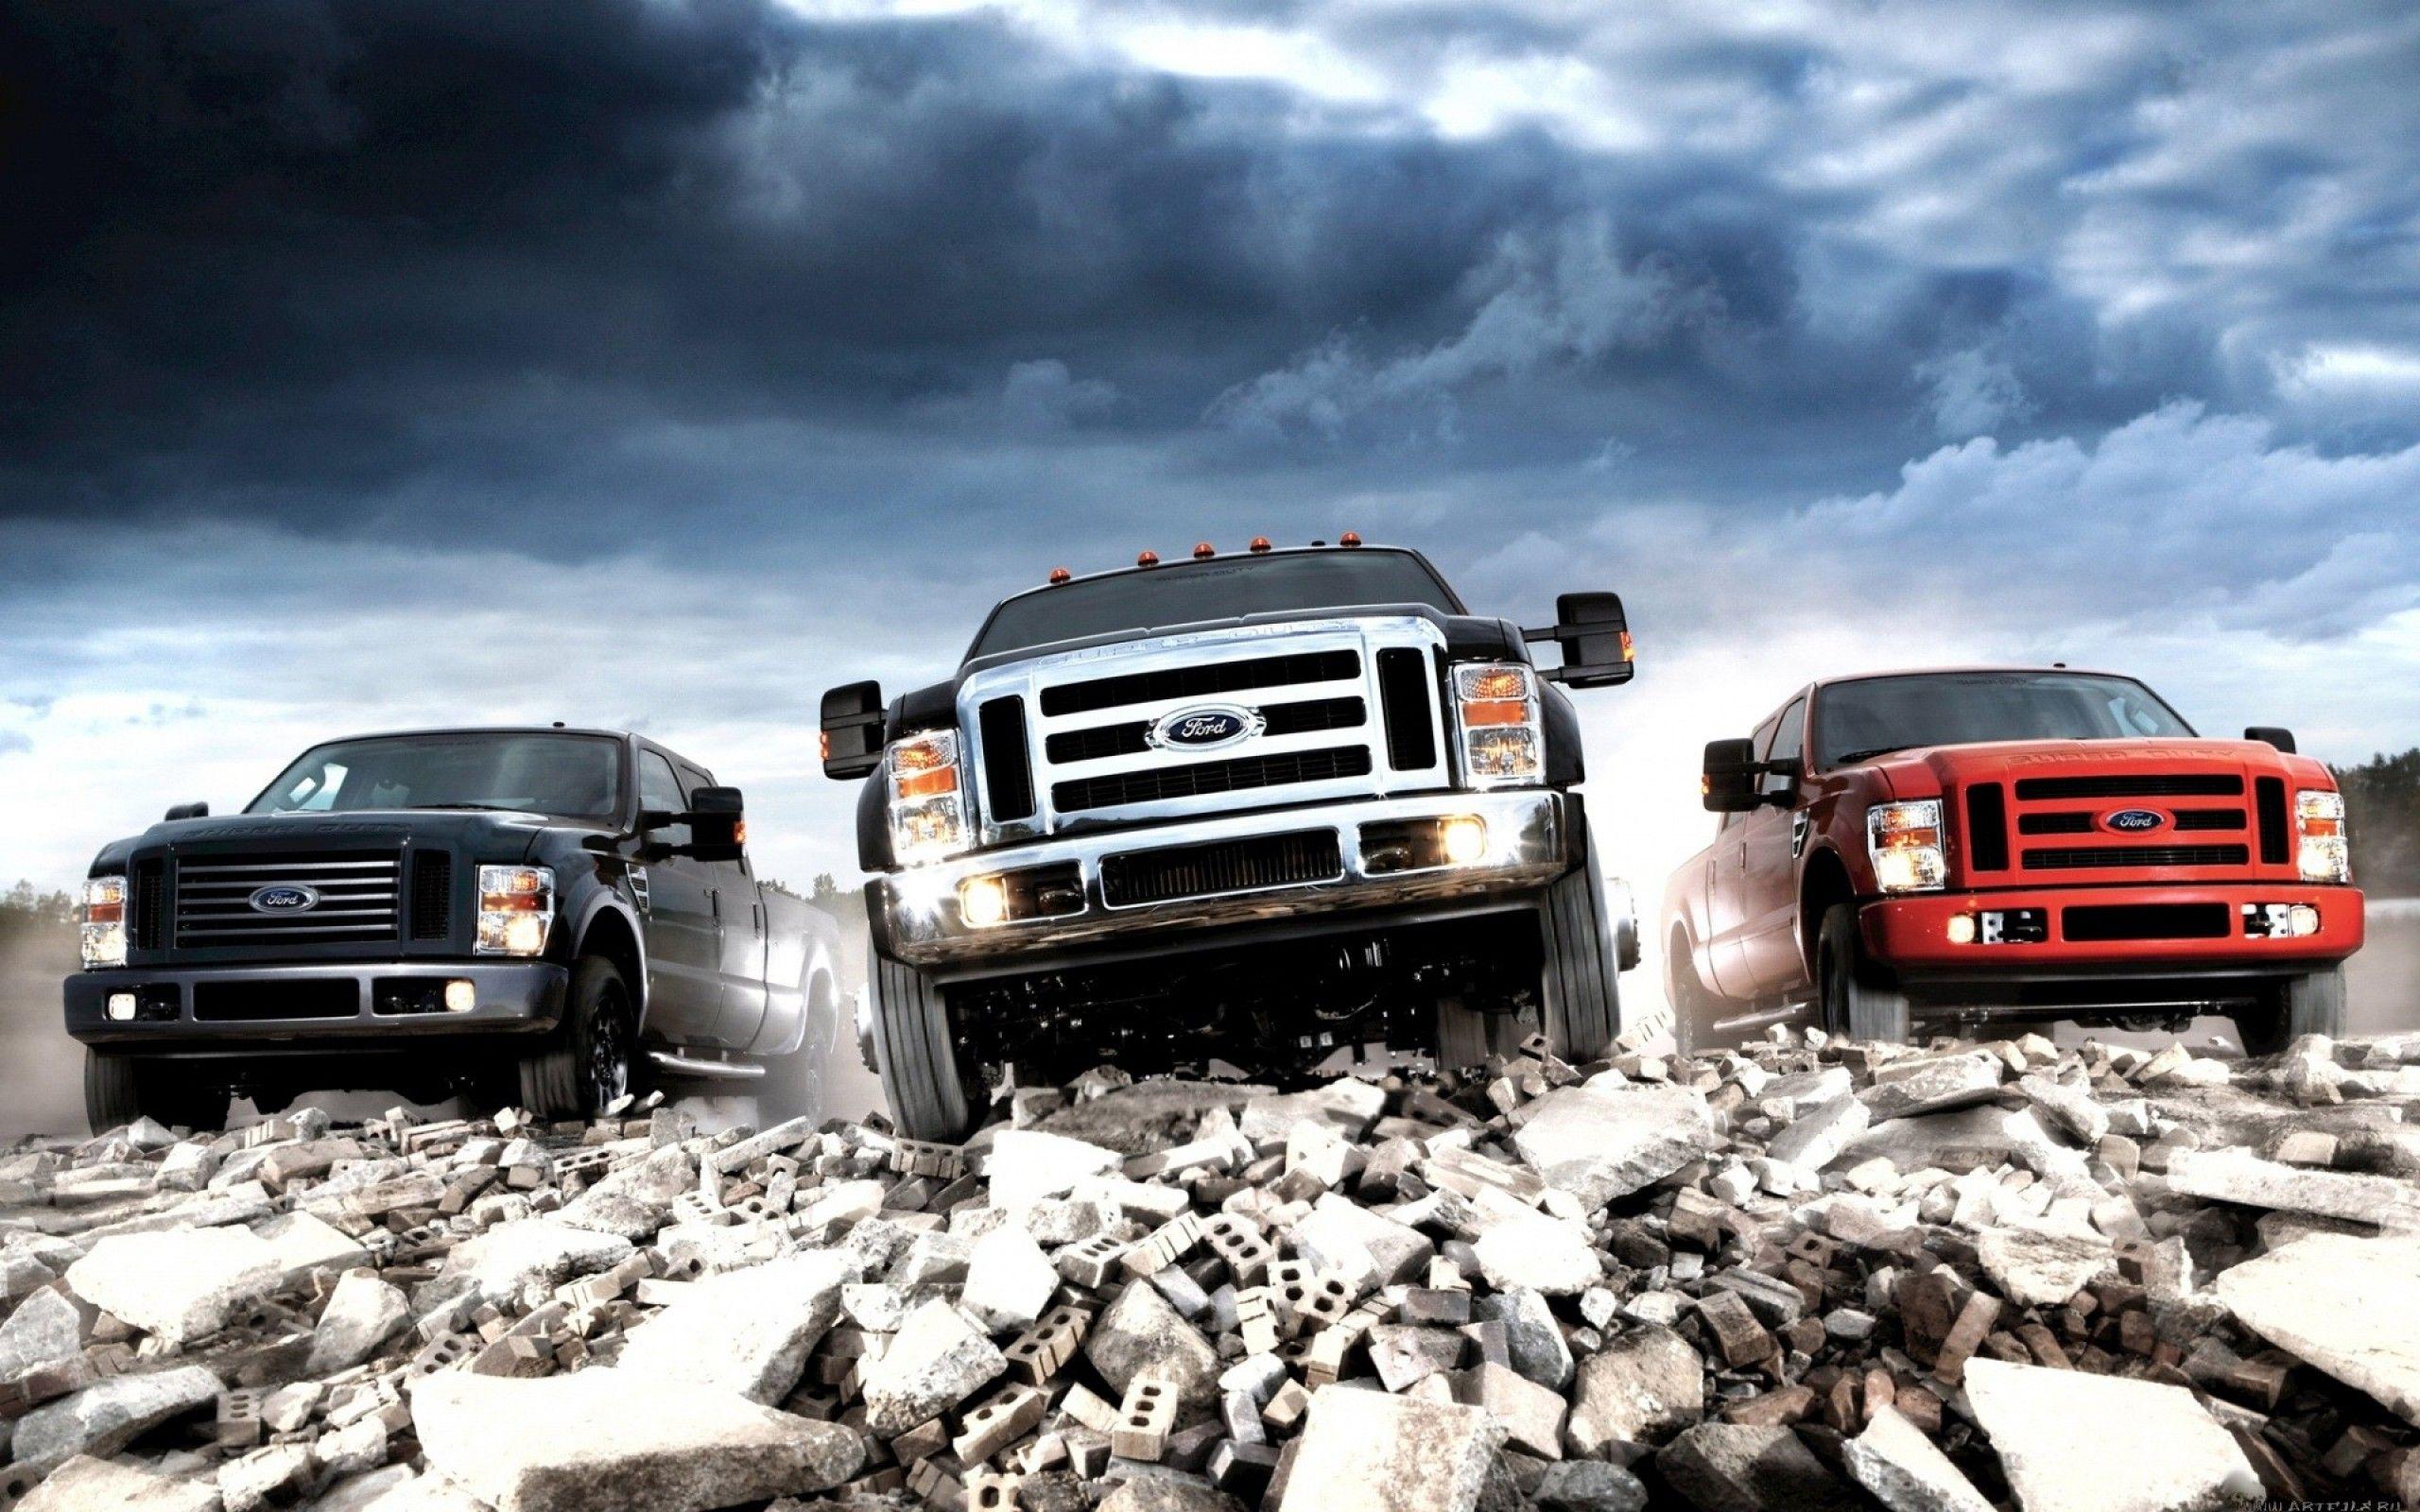 Ford Trucks Vehicles Pickup Trucks Wallpaper 2757258 Wallbase Cc Ford Trucks Diesel Trucks Truck Wallpapers